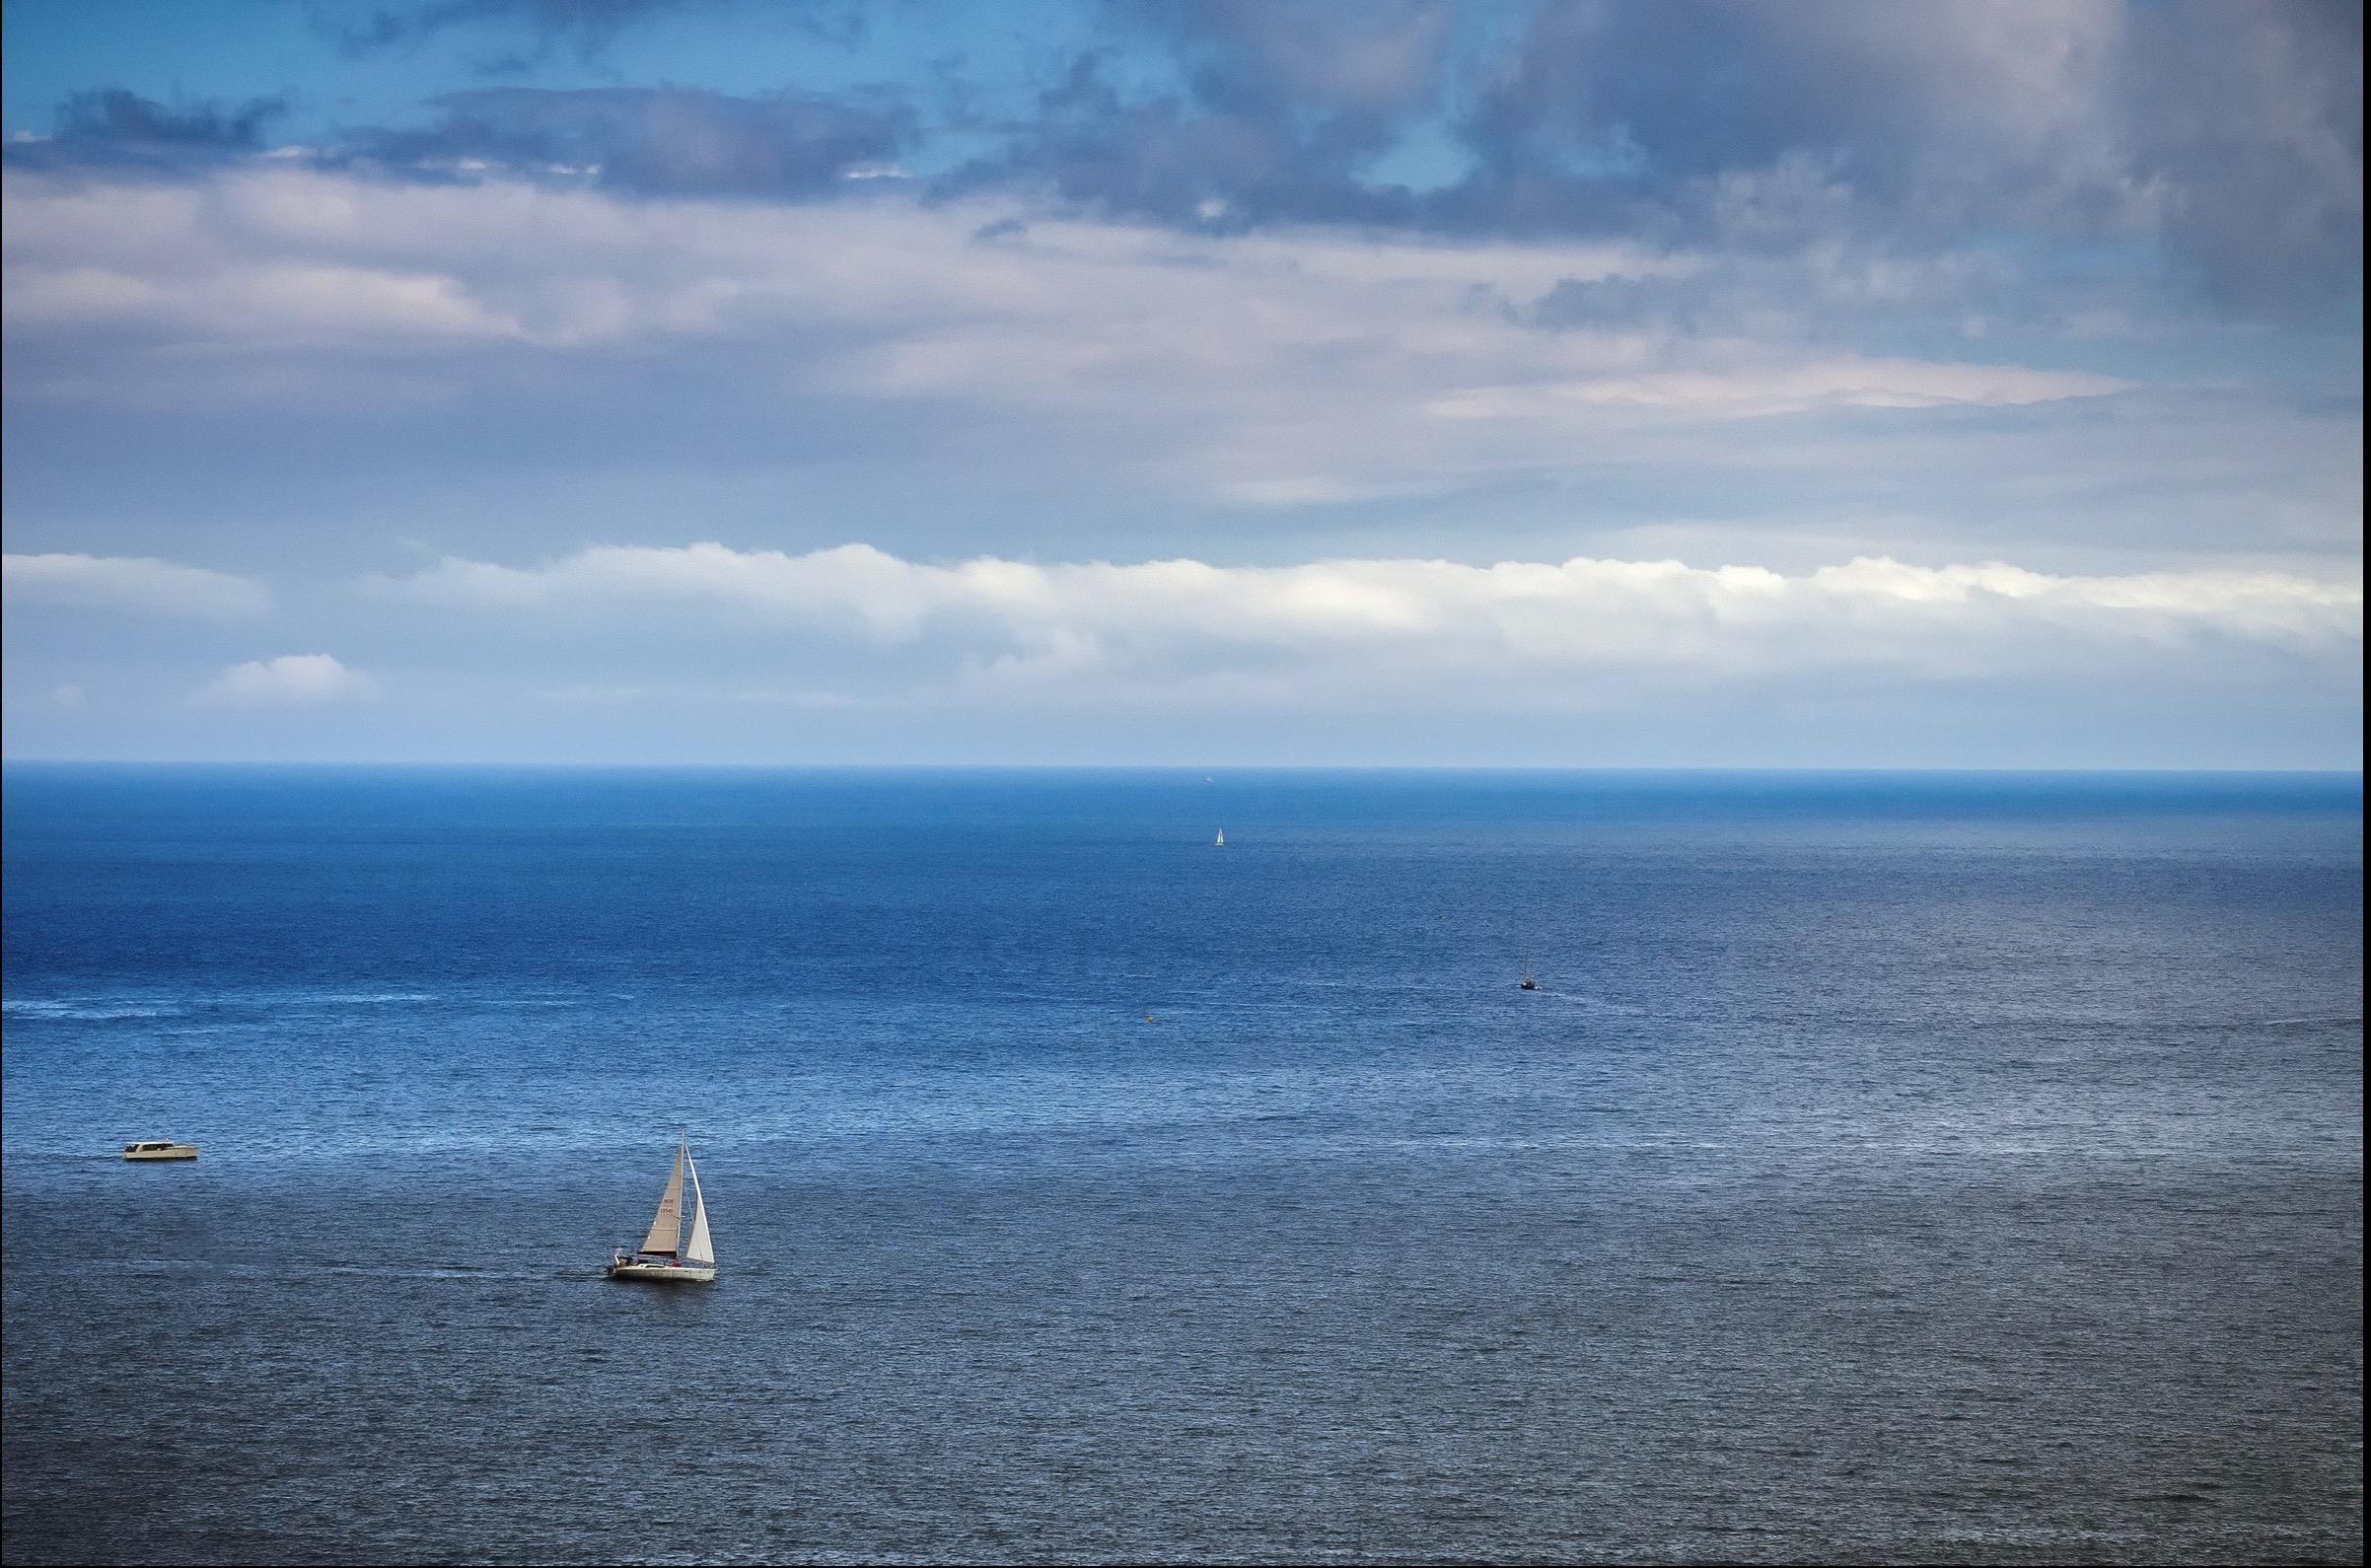 Sailboat on Loch Lomand, Scotland